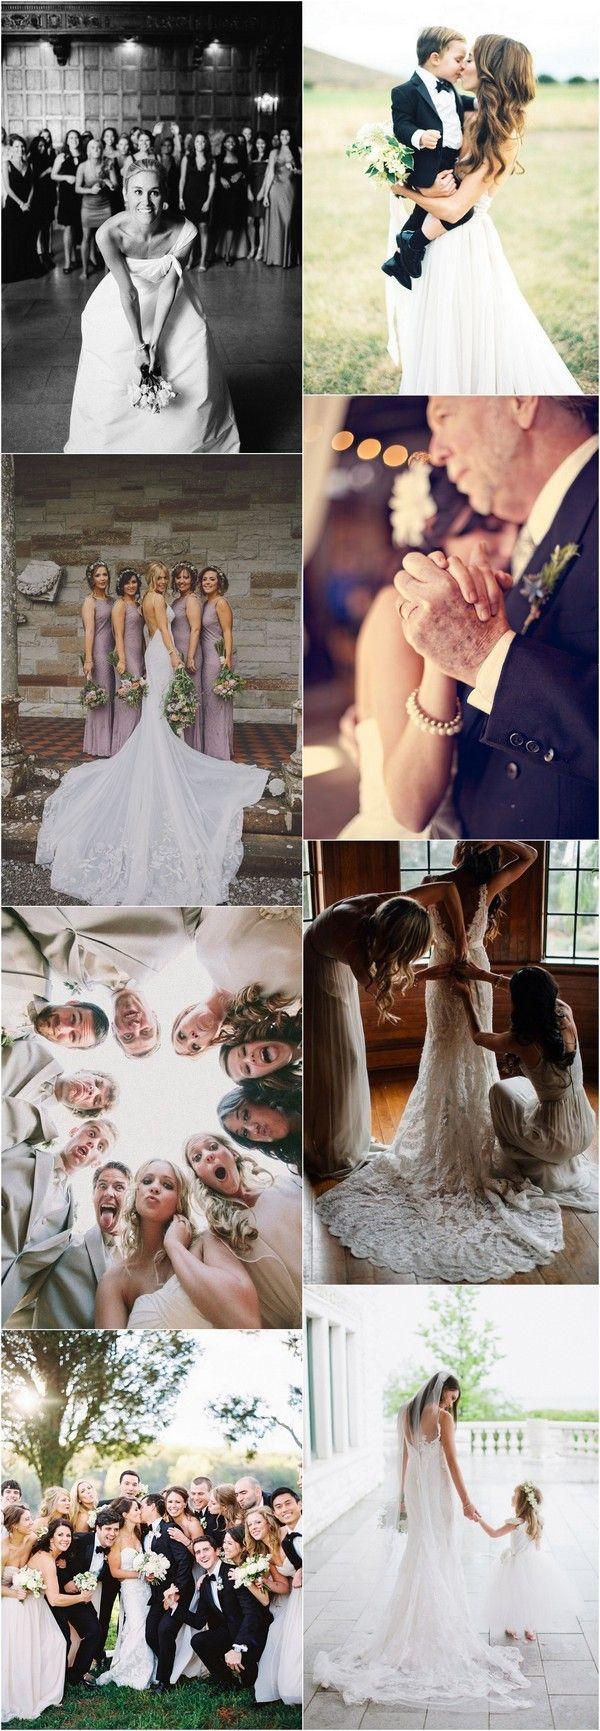 creative wedding party photo ideas # photo ideas # wedding …